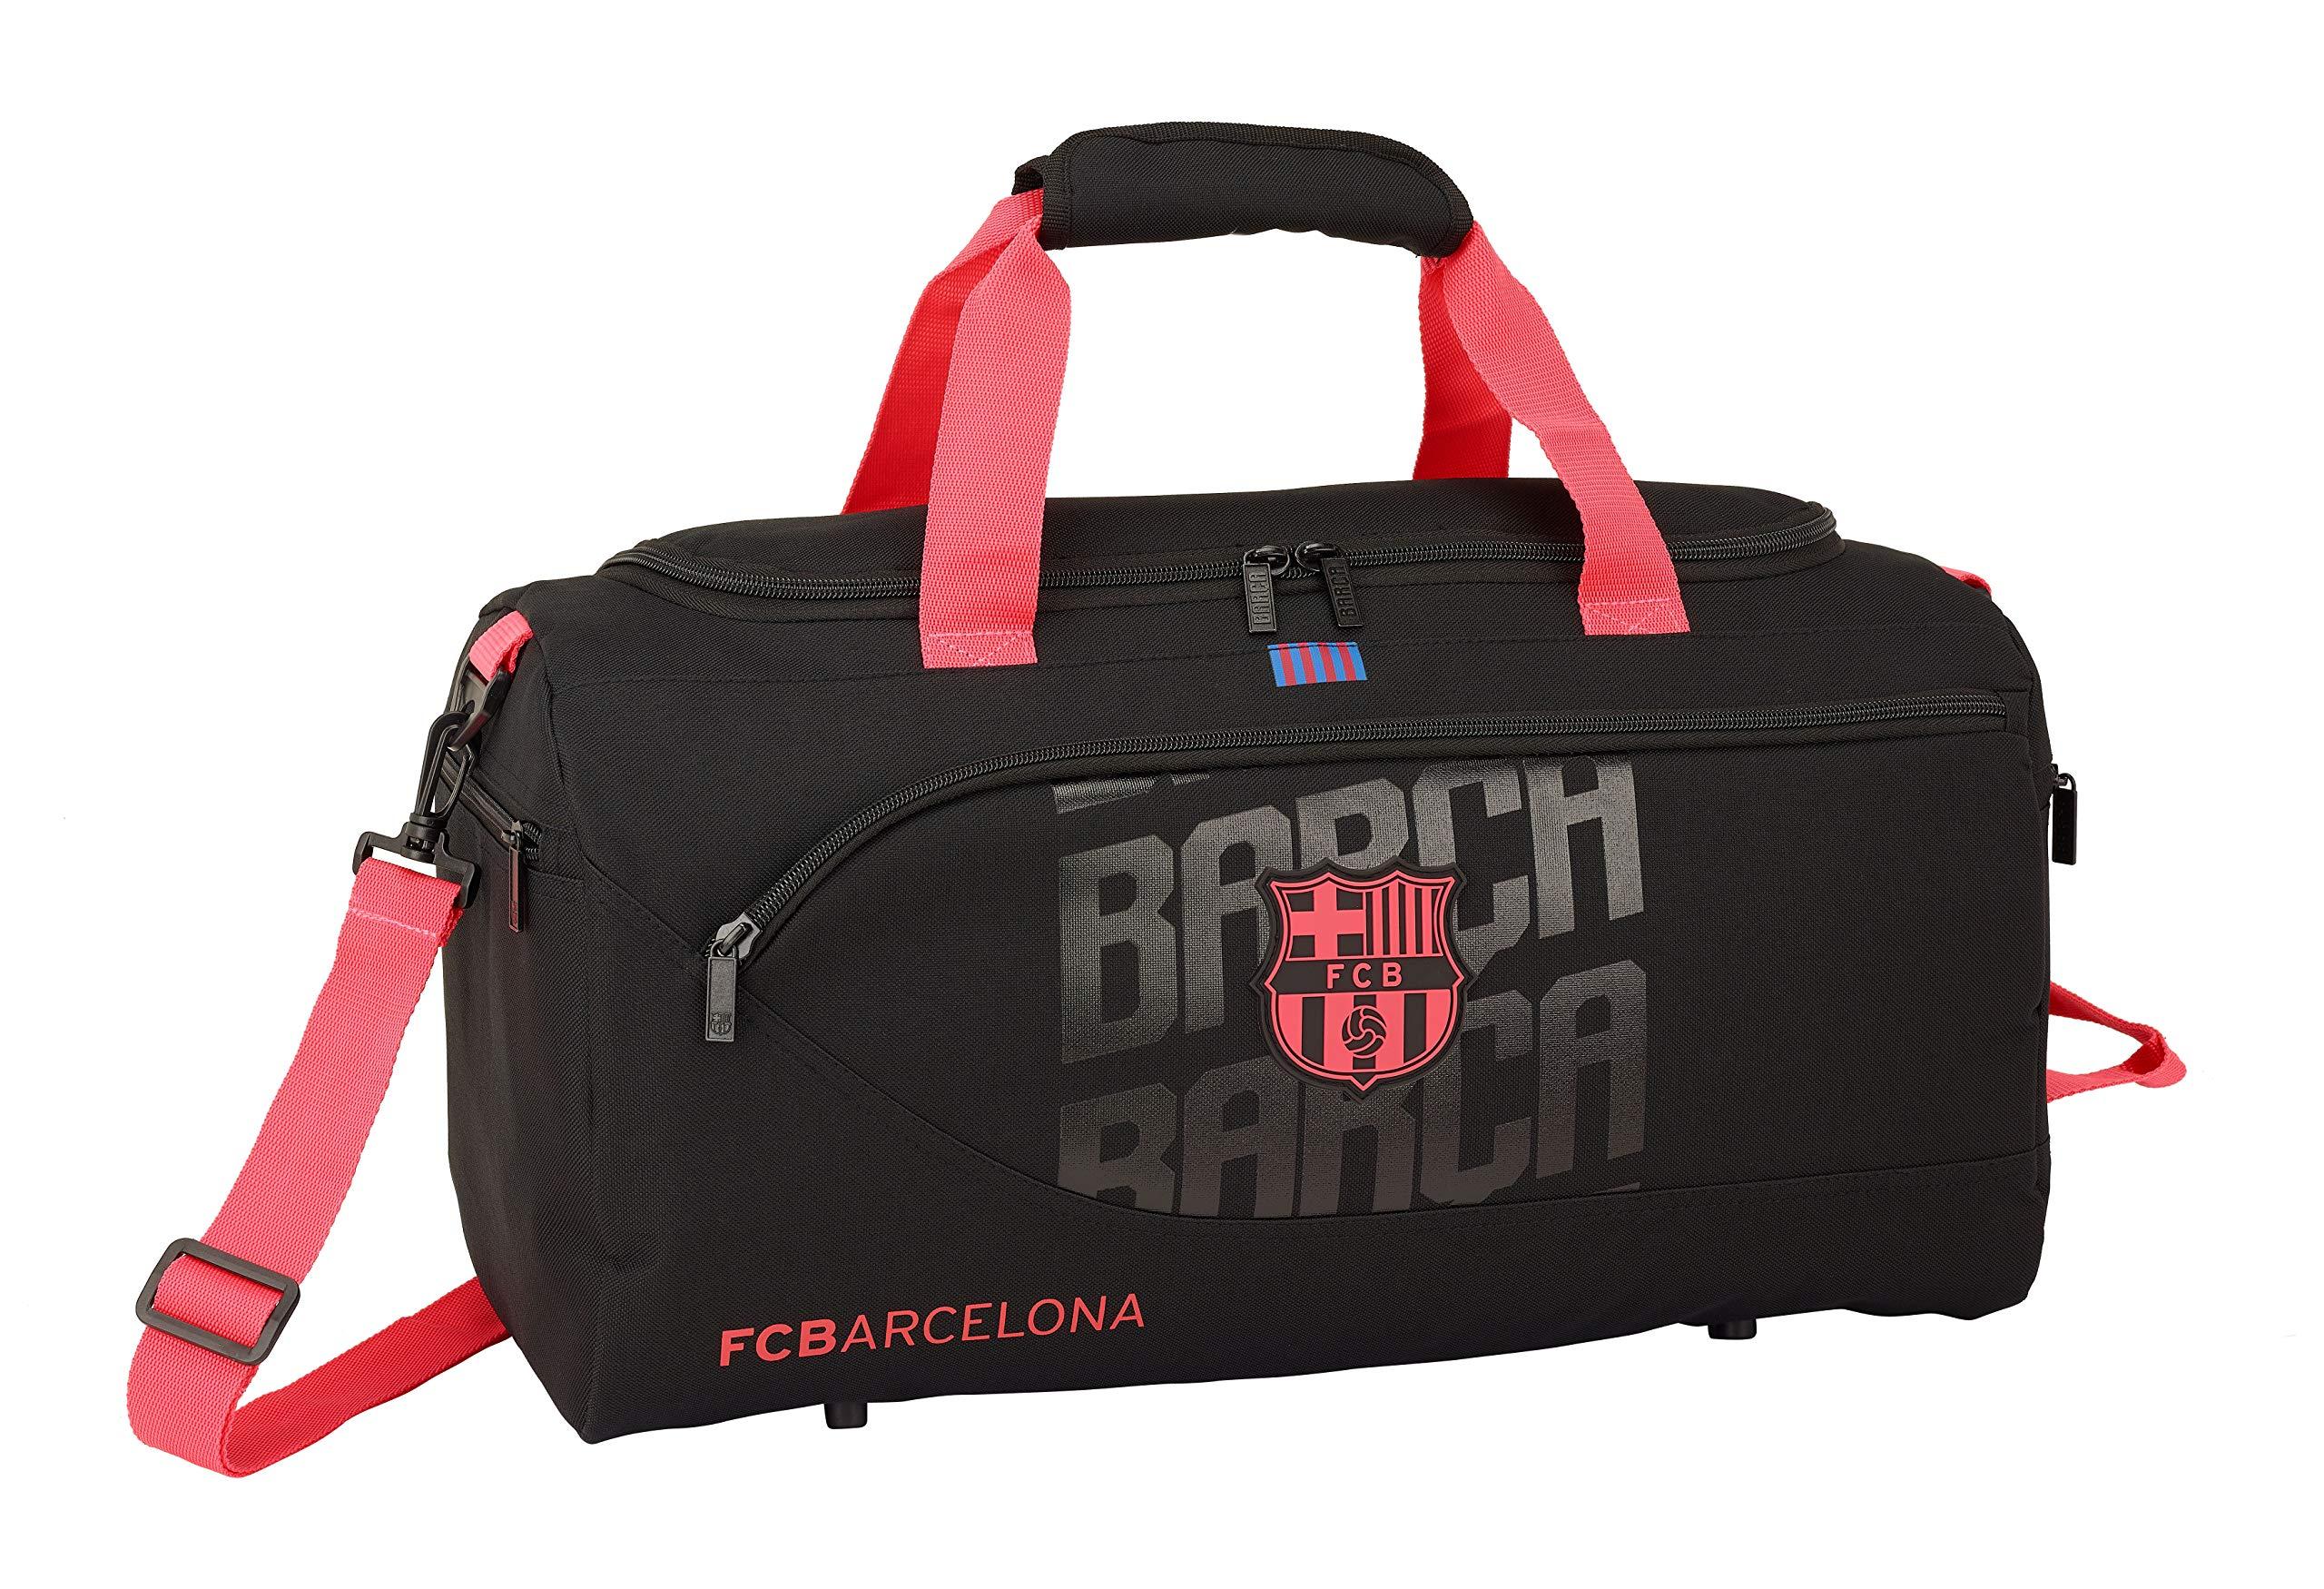 FC-Barcelona-SAFTA-Fc-Oficial-Bolsa-De-Deporte-Sporttasche-50-cm-31-liters-Blau-Azul